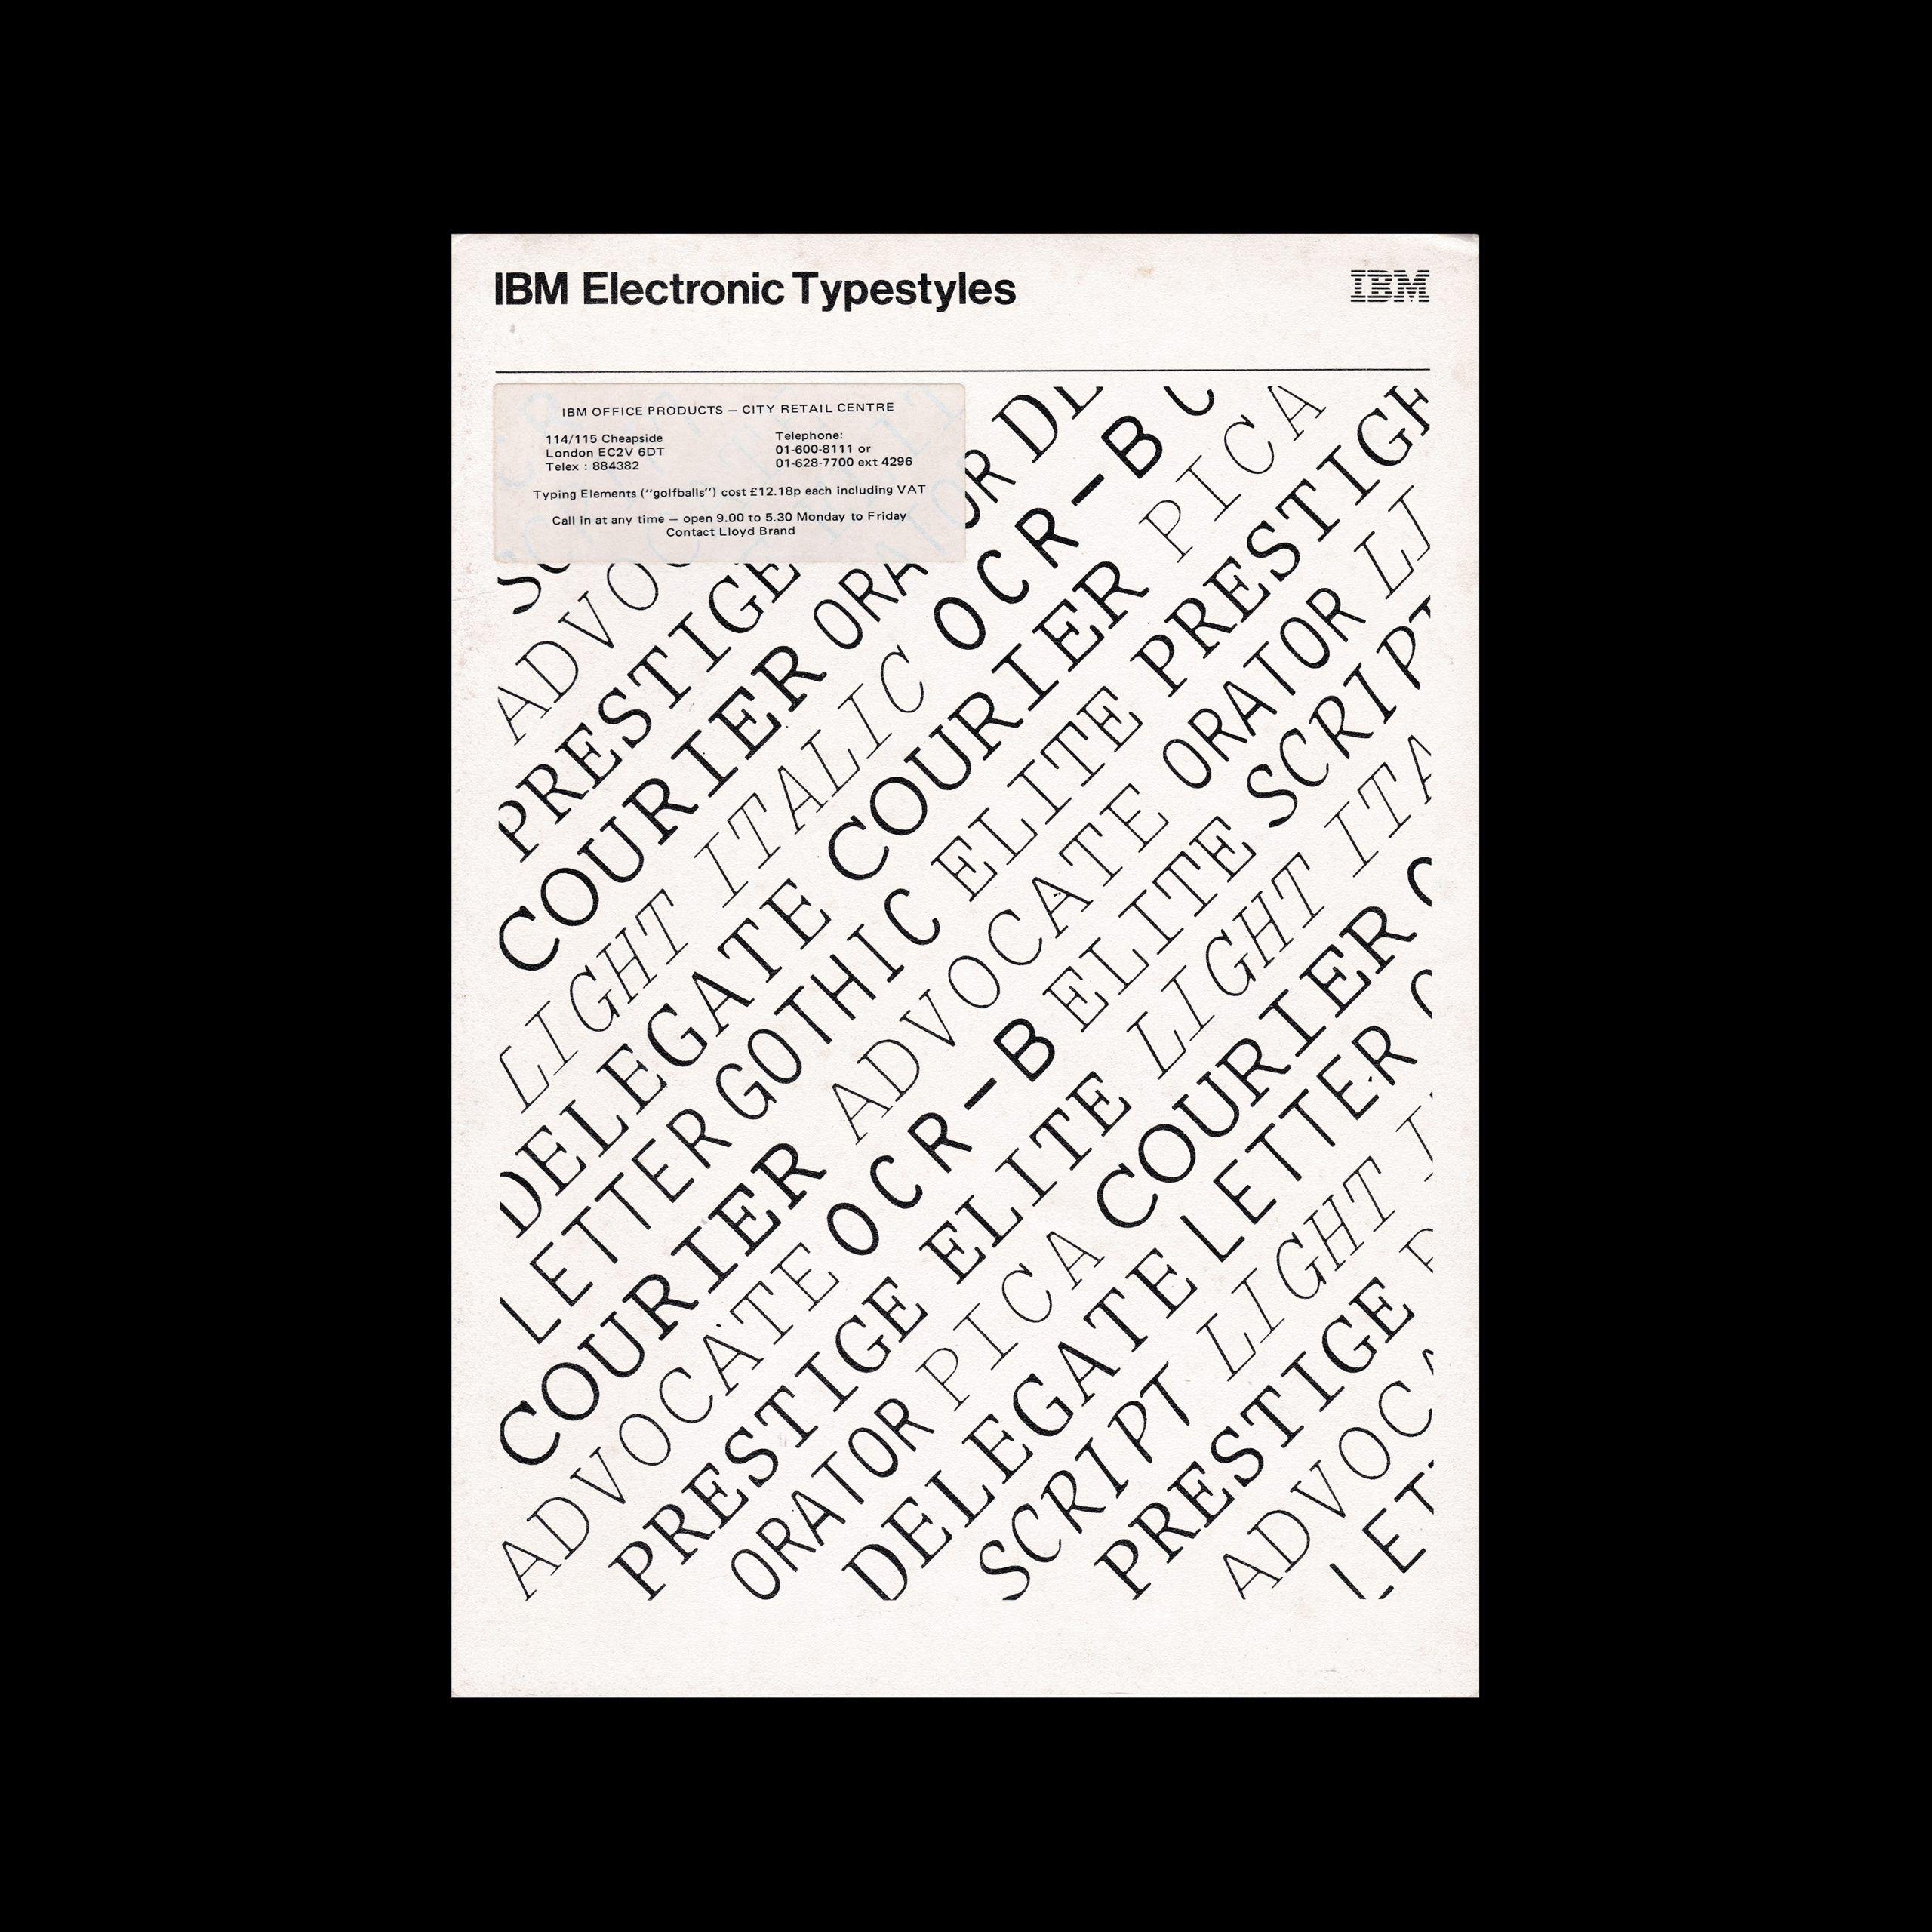 IBM Electronic Typestyles Catalogue